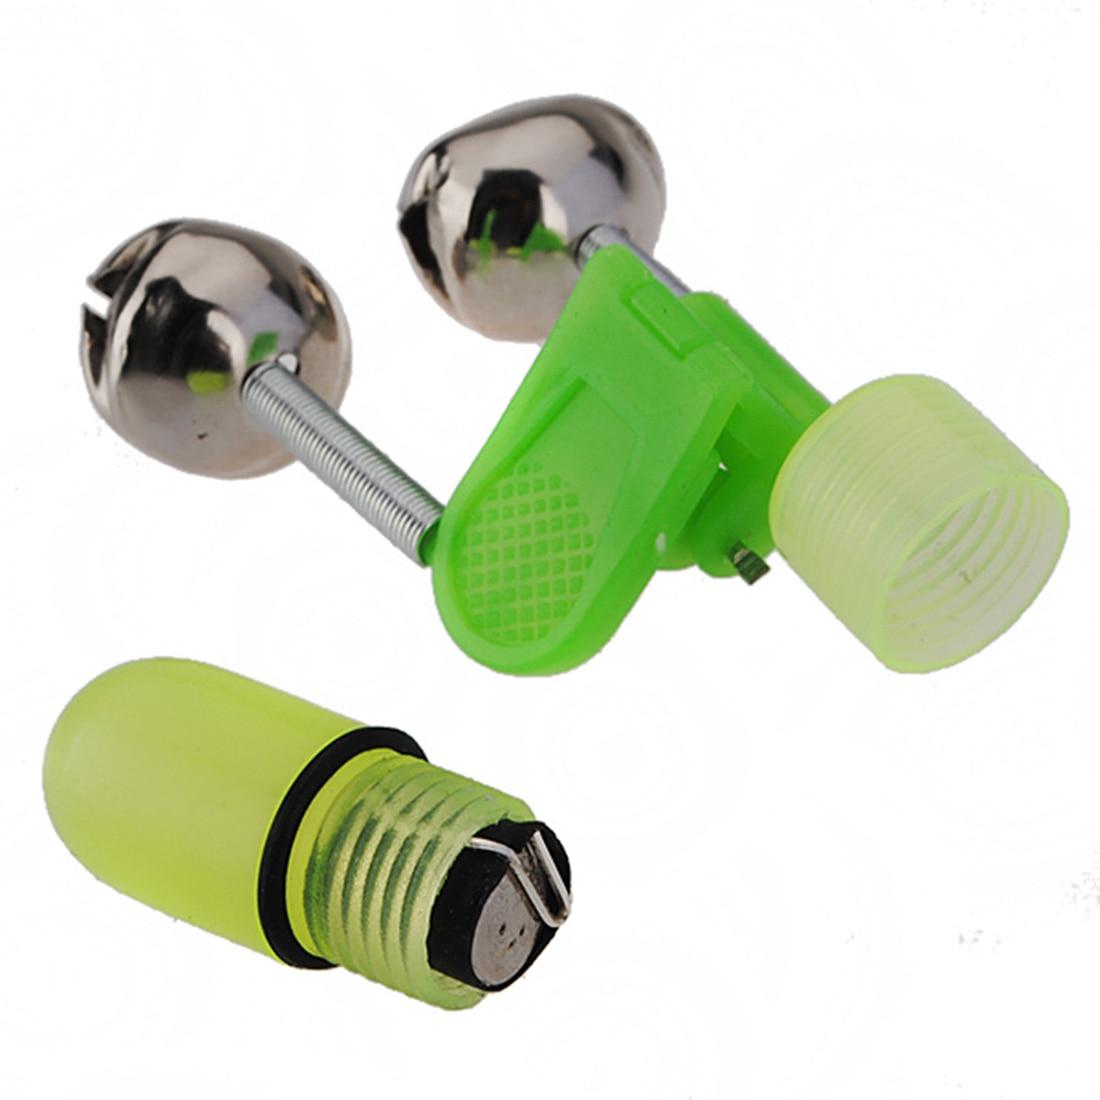 3 Pcs of (5x Lake Sea Fishing Rod Tip Bite Bell LED Light Indicator Clip Night Alarm Tool yellow-green)